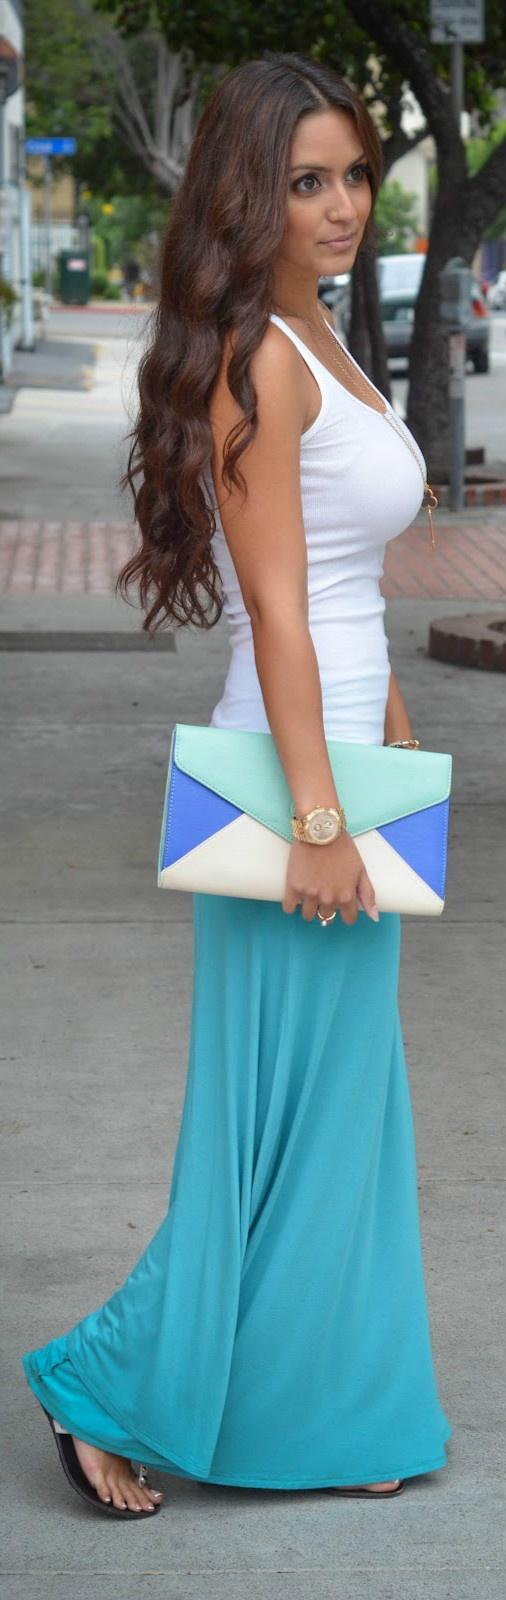 colorful-maxi-white-tank-big-clutch-purse-wallpaper-wp5804668